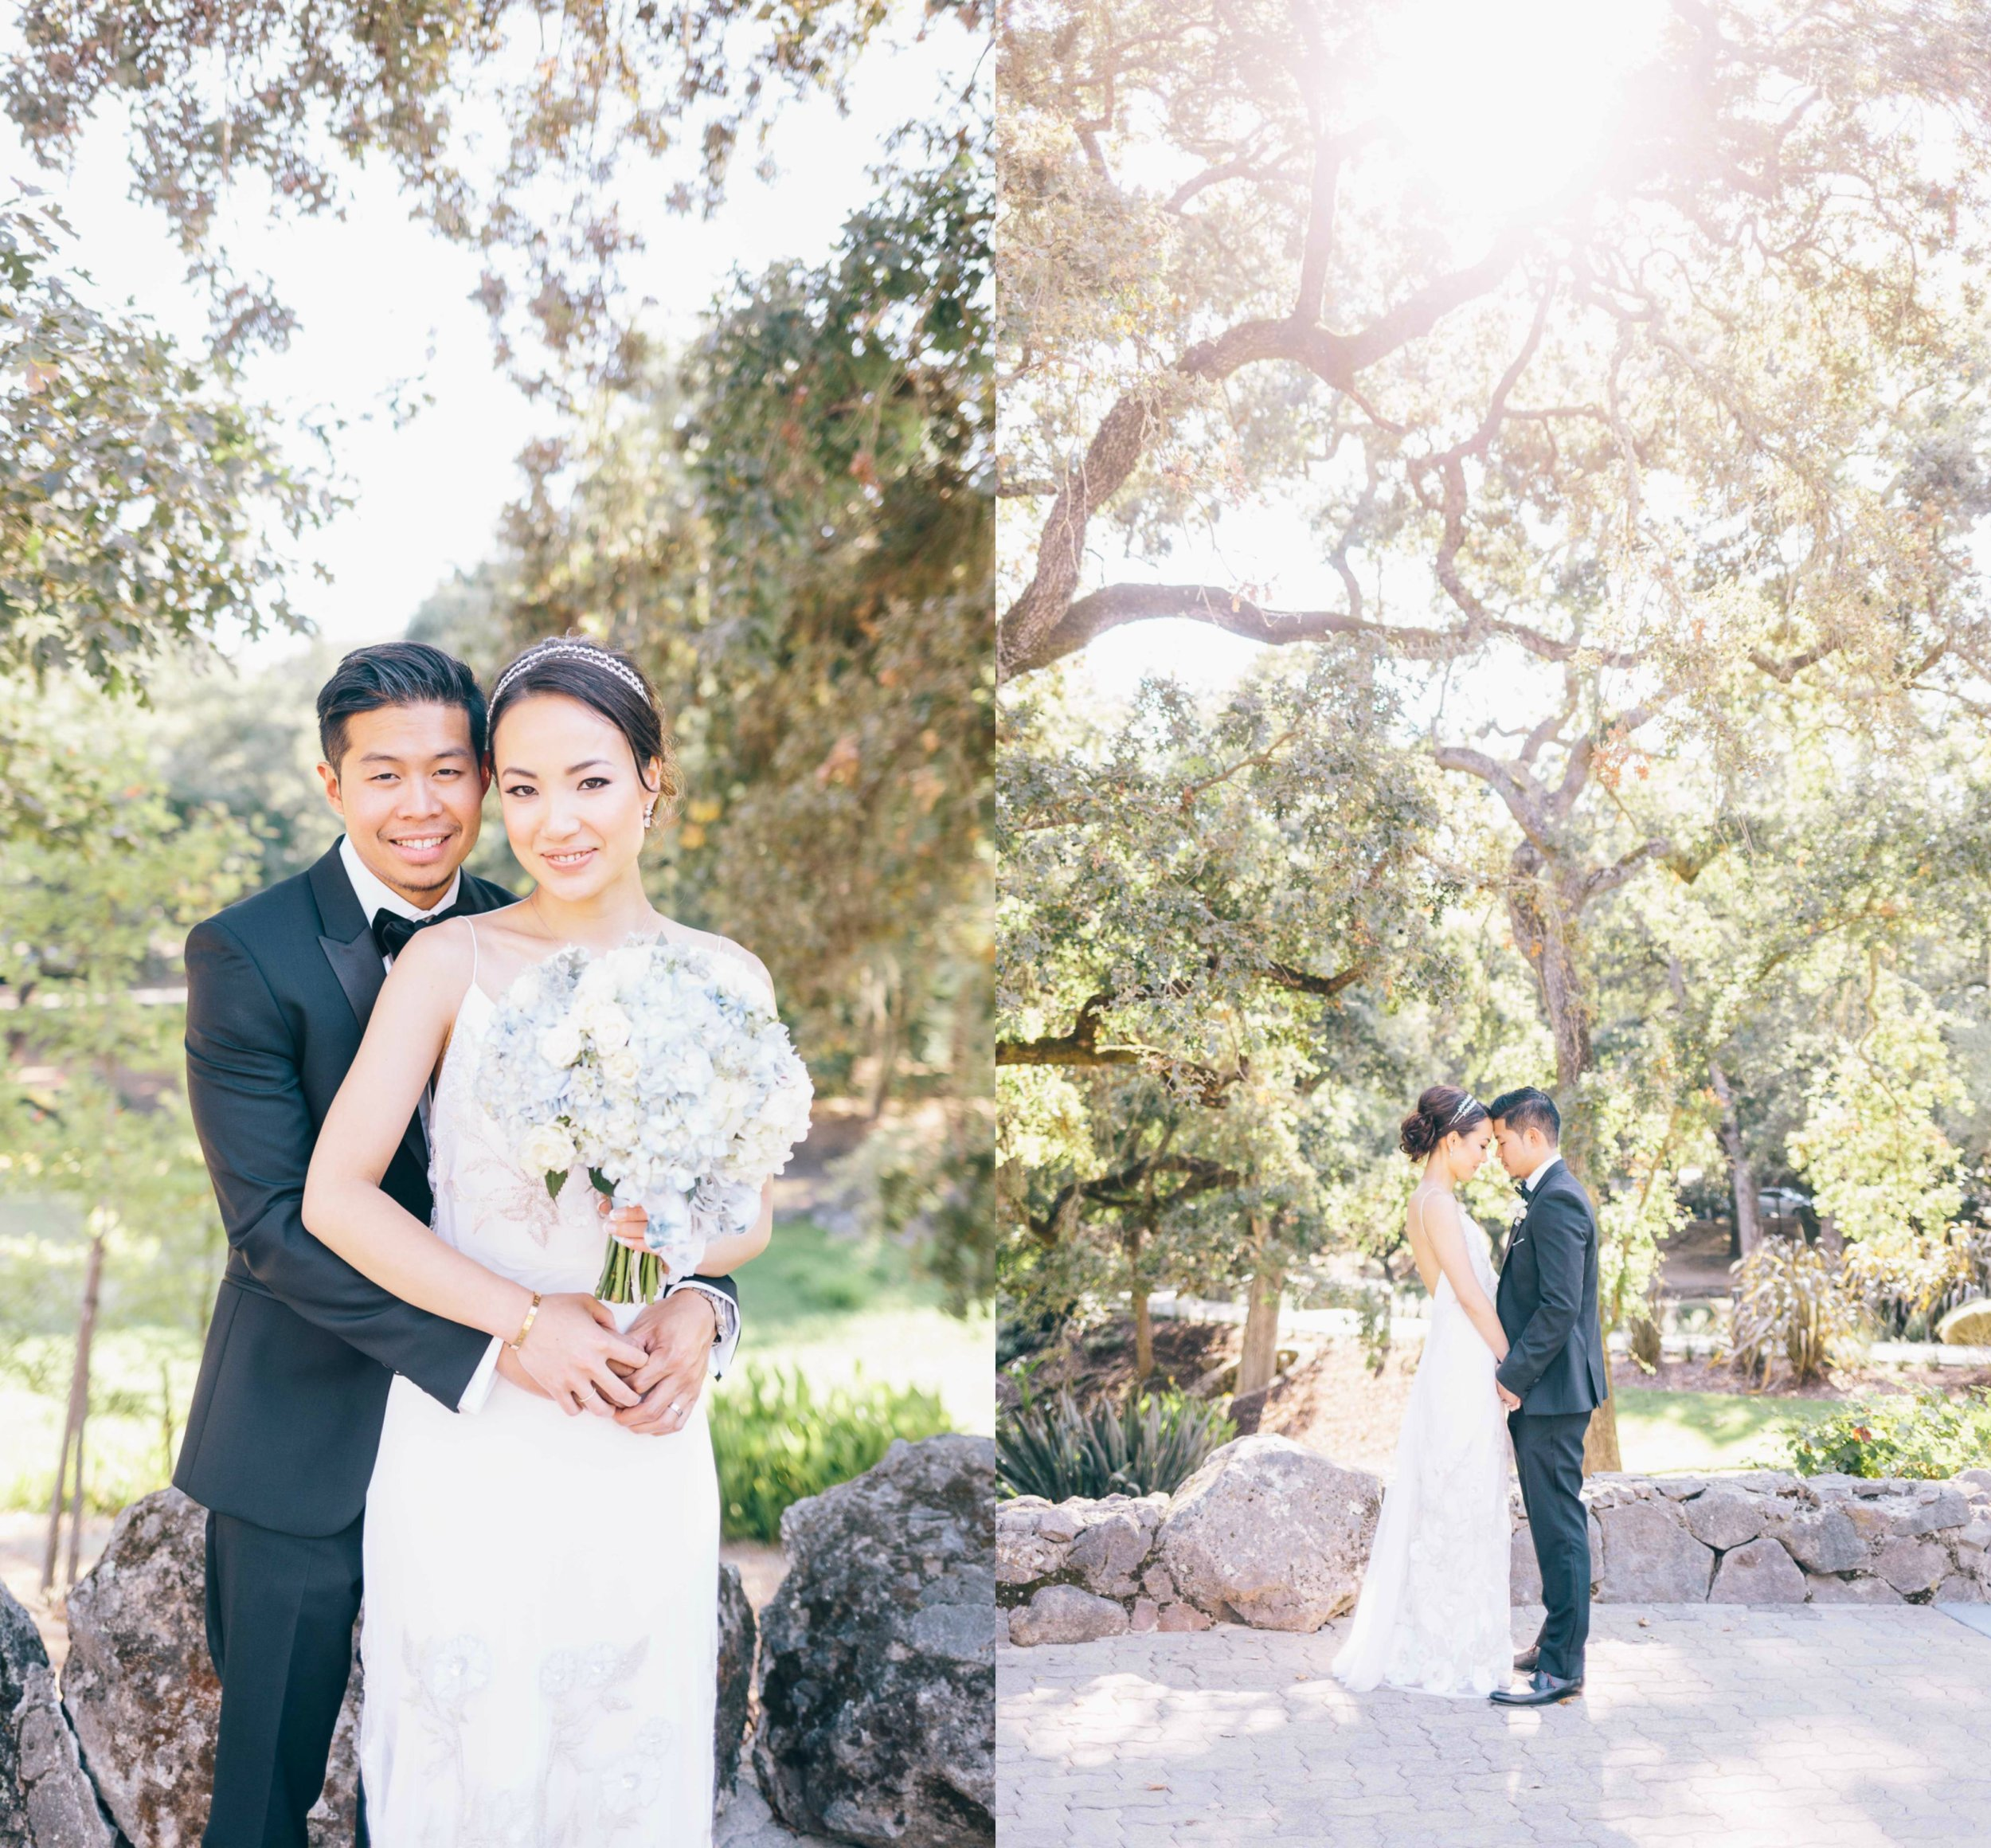 Westin Verasa Wedding at La Toque - JBJ Pictures Wedding Photographer in Napa Sonoma and San Francisco - 1 (5).jpg